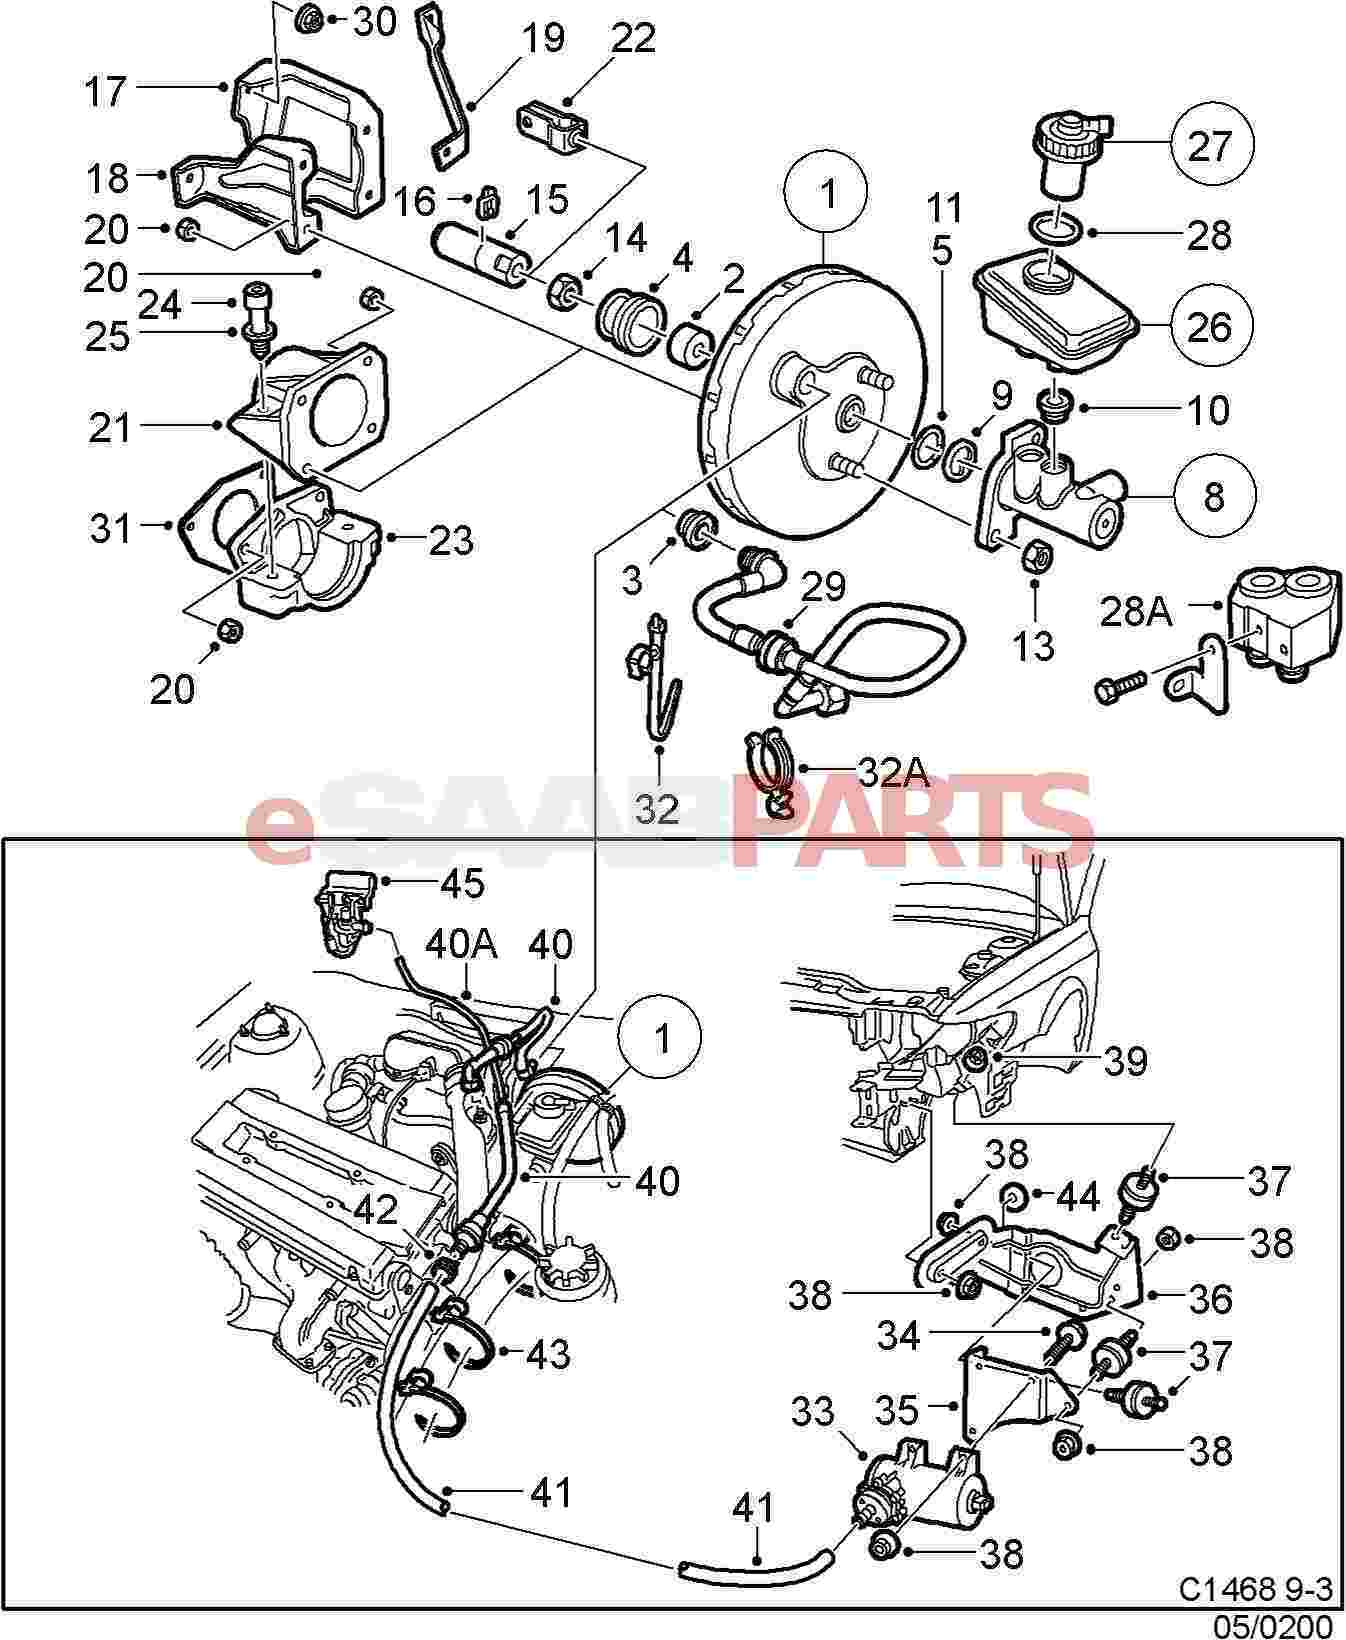 hight resolution of saab 99 engine diagram wiring schematic rh 40 yehonalatapes de 2002 saab 9 3 engine diagram saab engine diagram 205